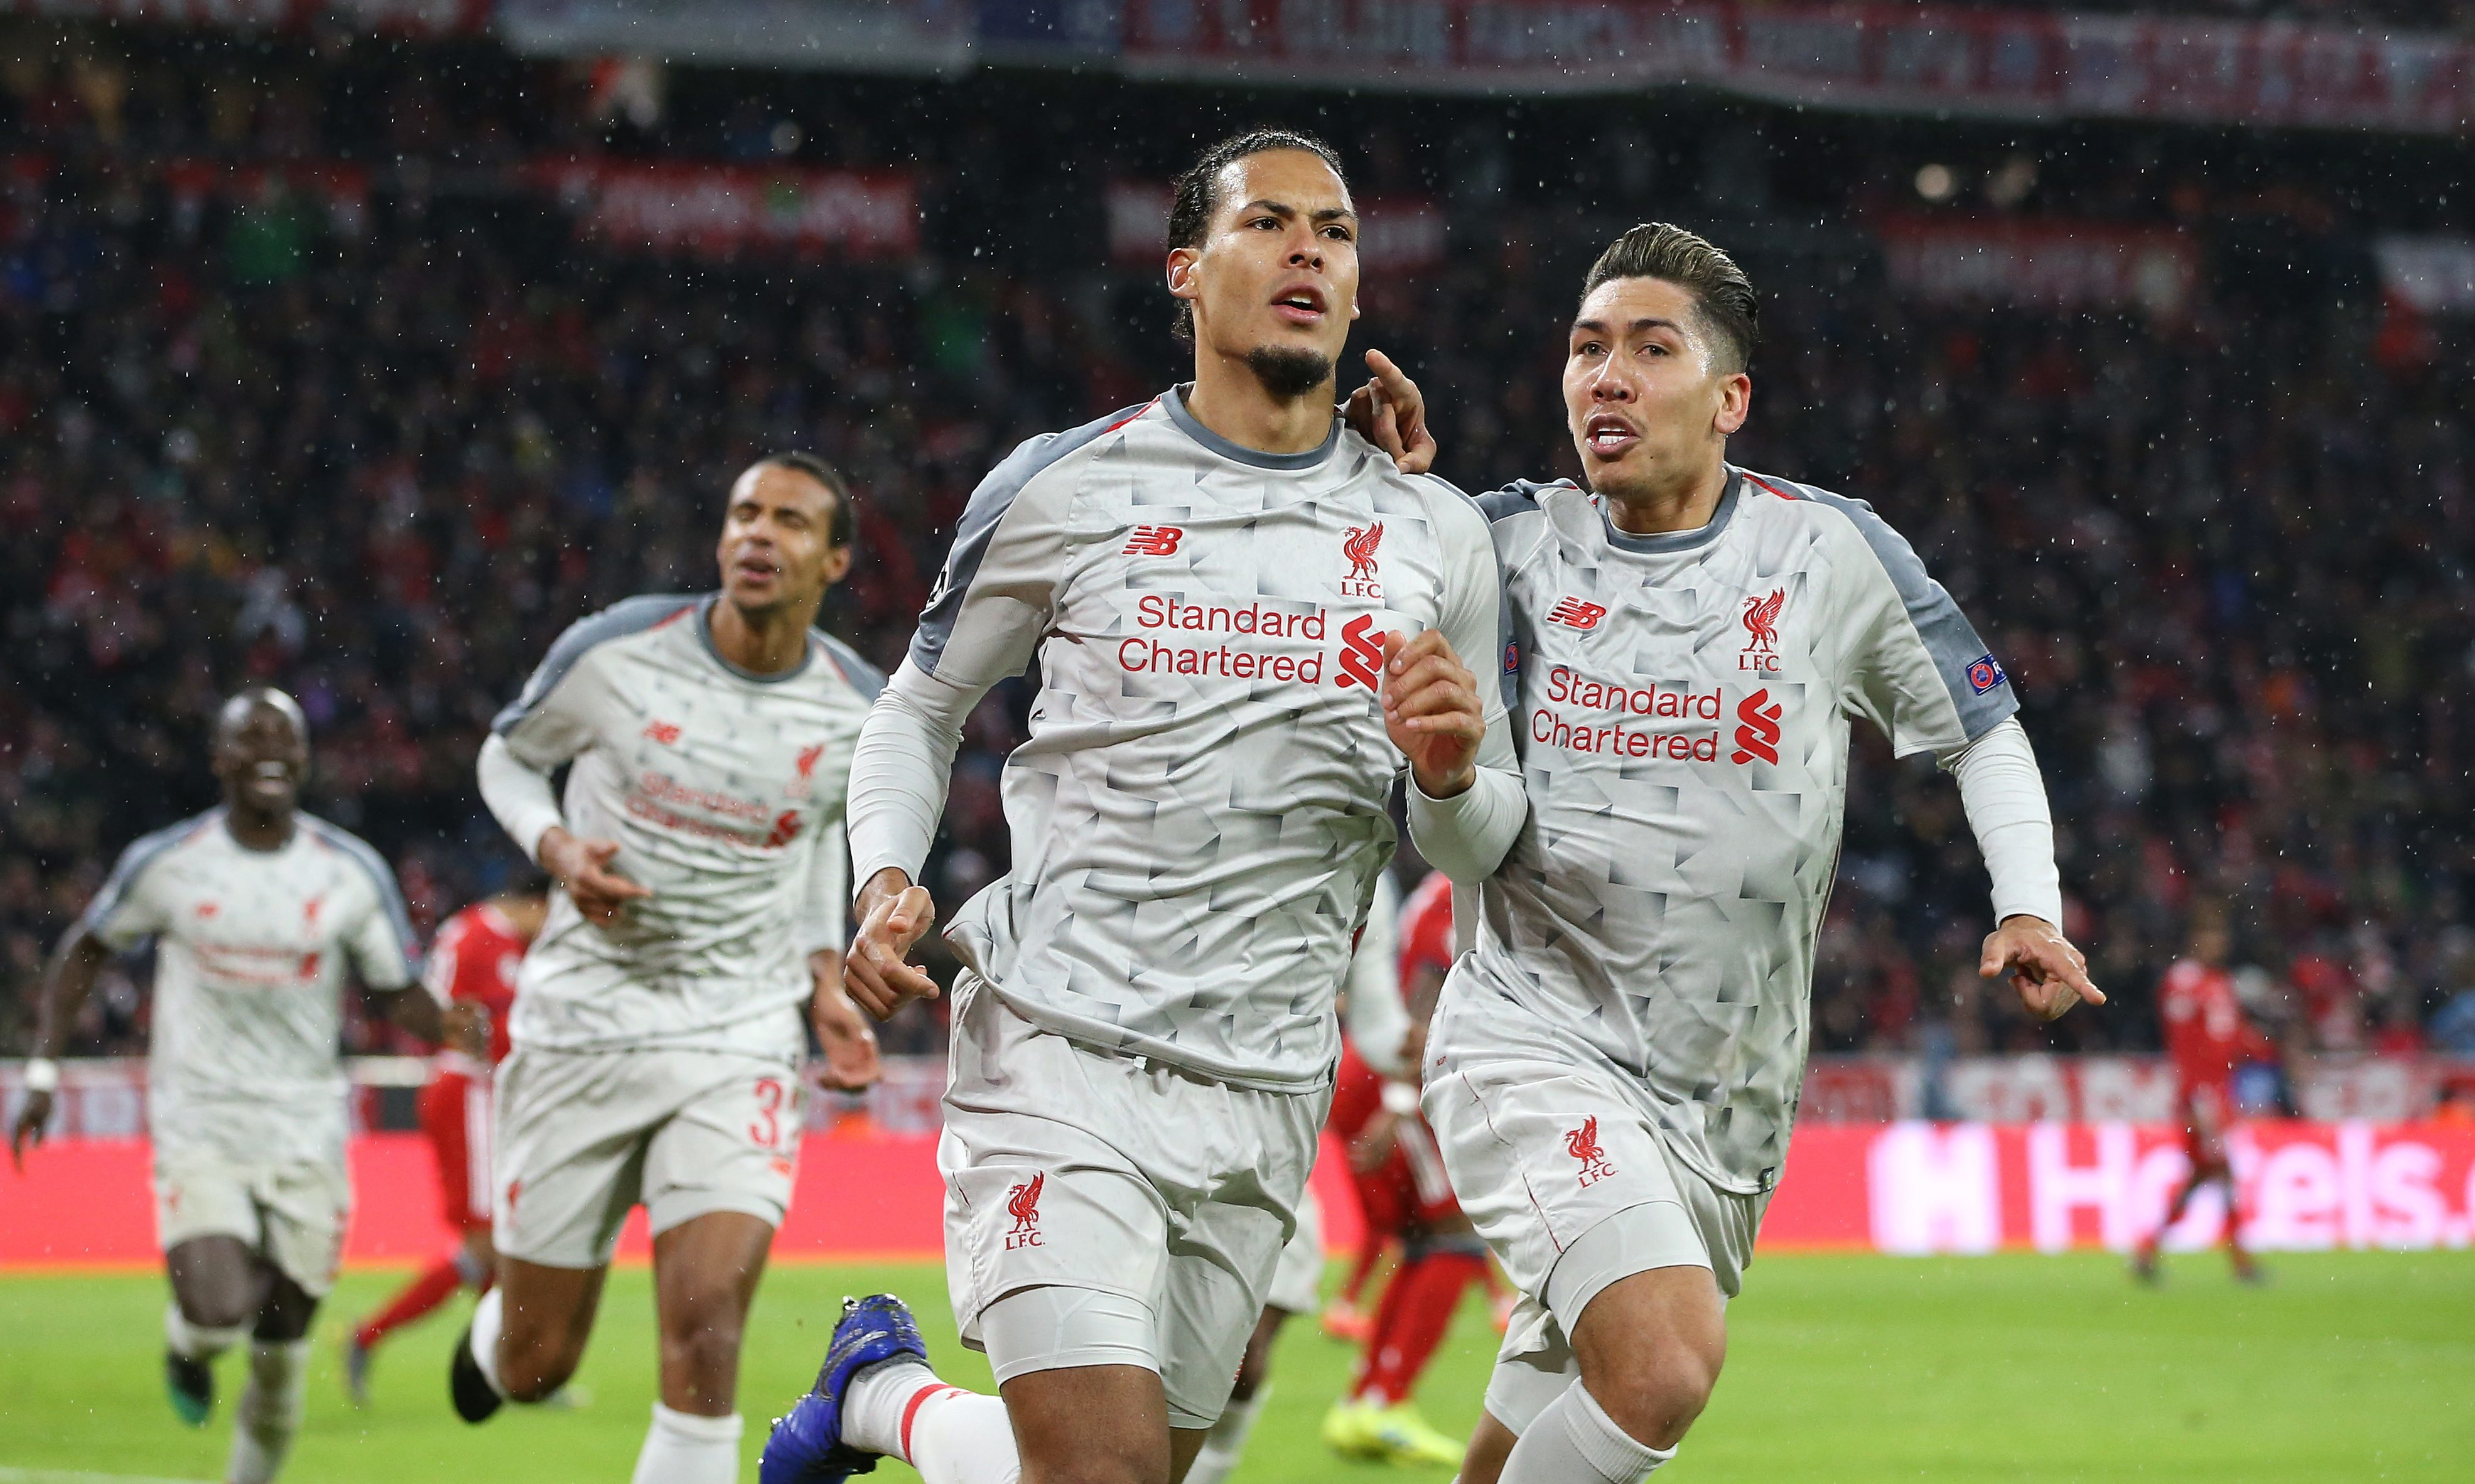 Bayern Munich's decline laid bare by Liverpool